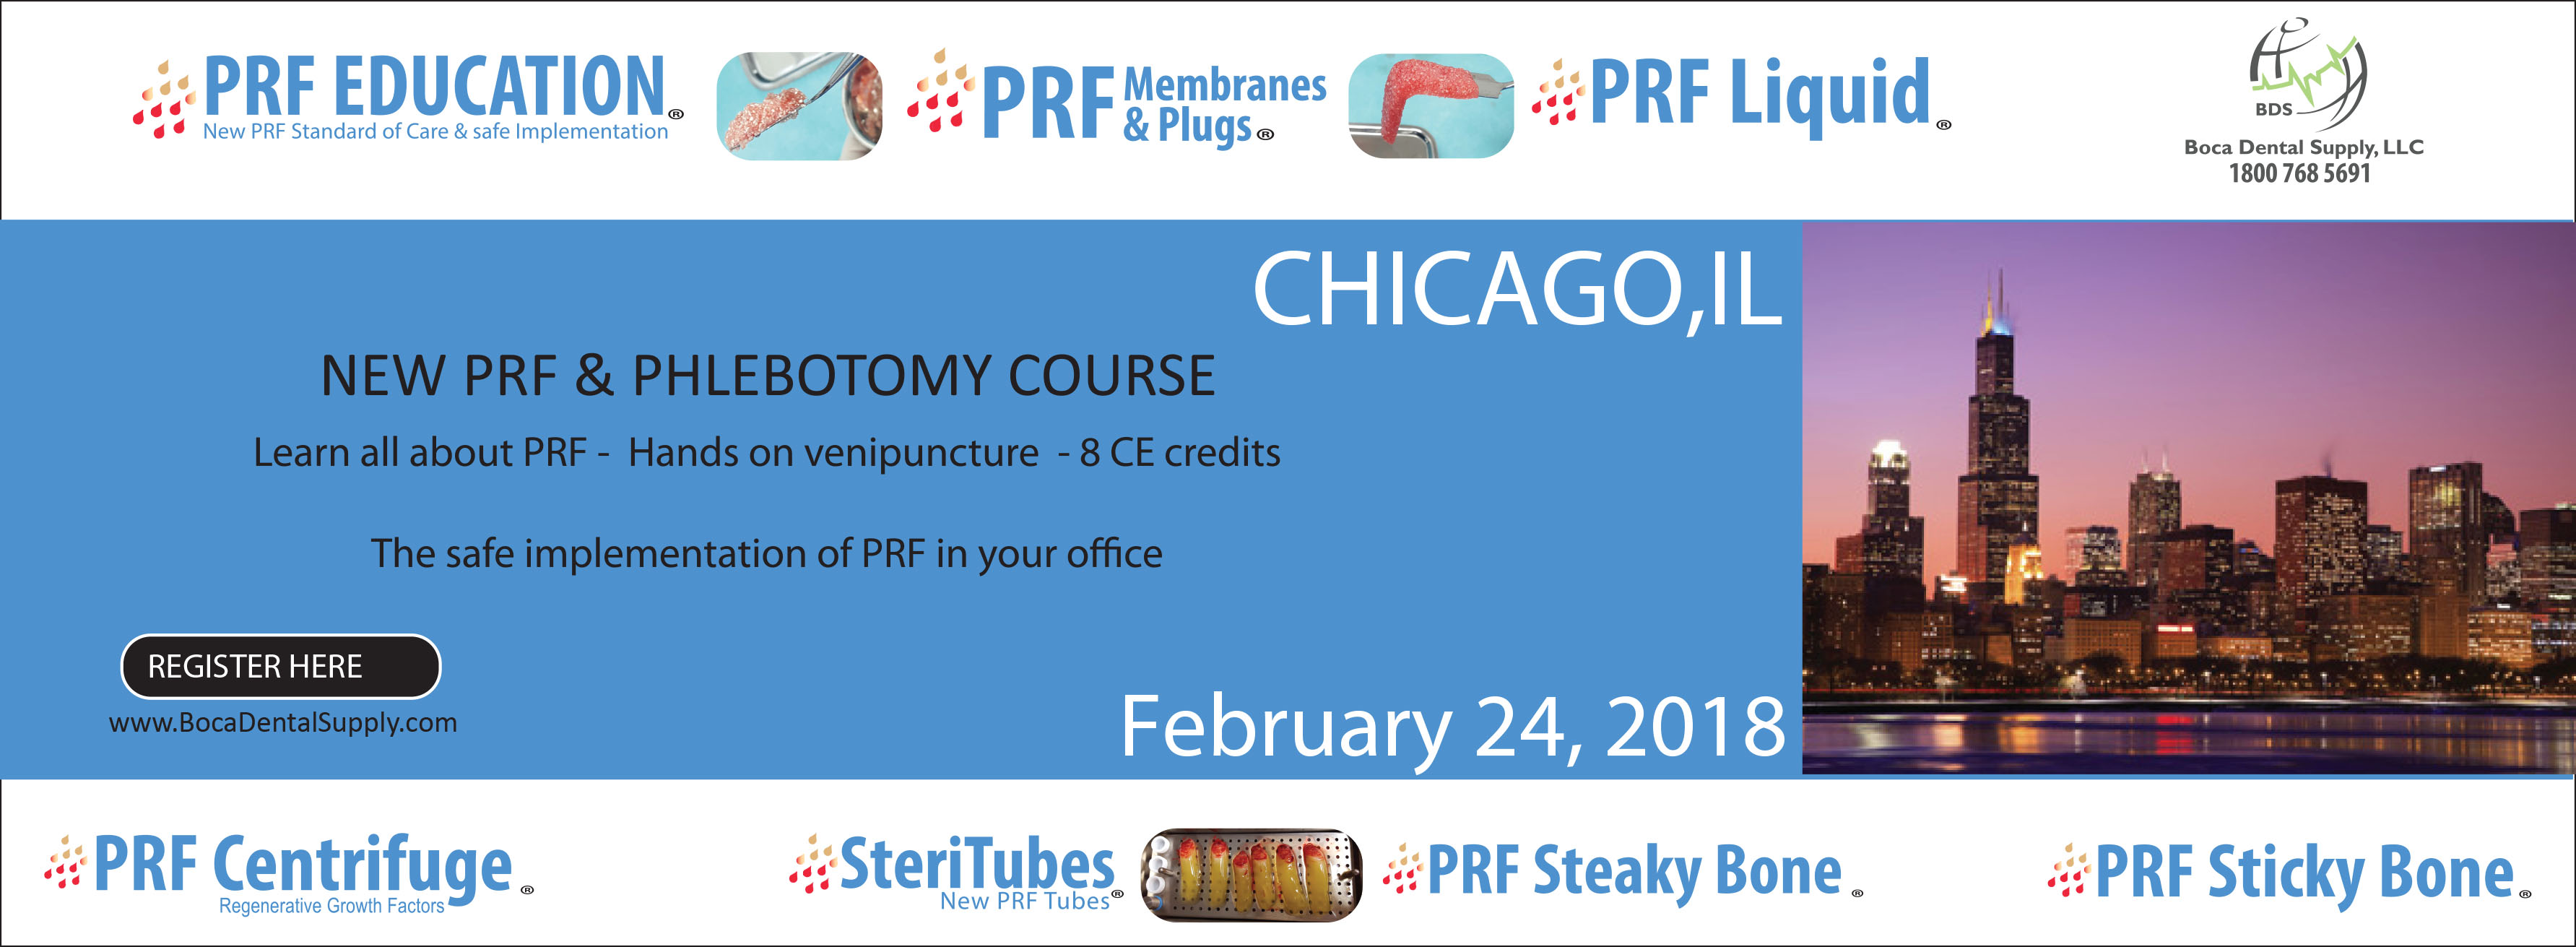 prf-course-chicago-2018.jpg